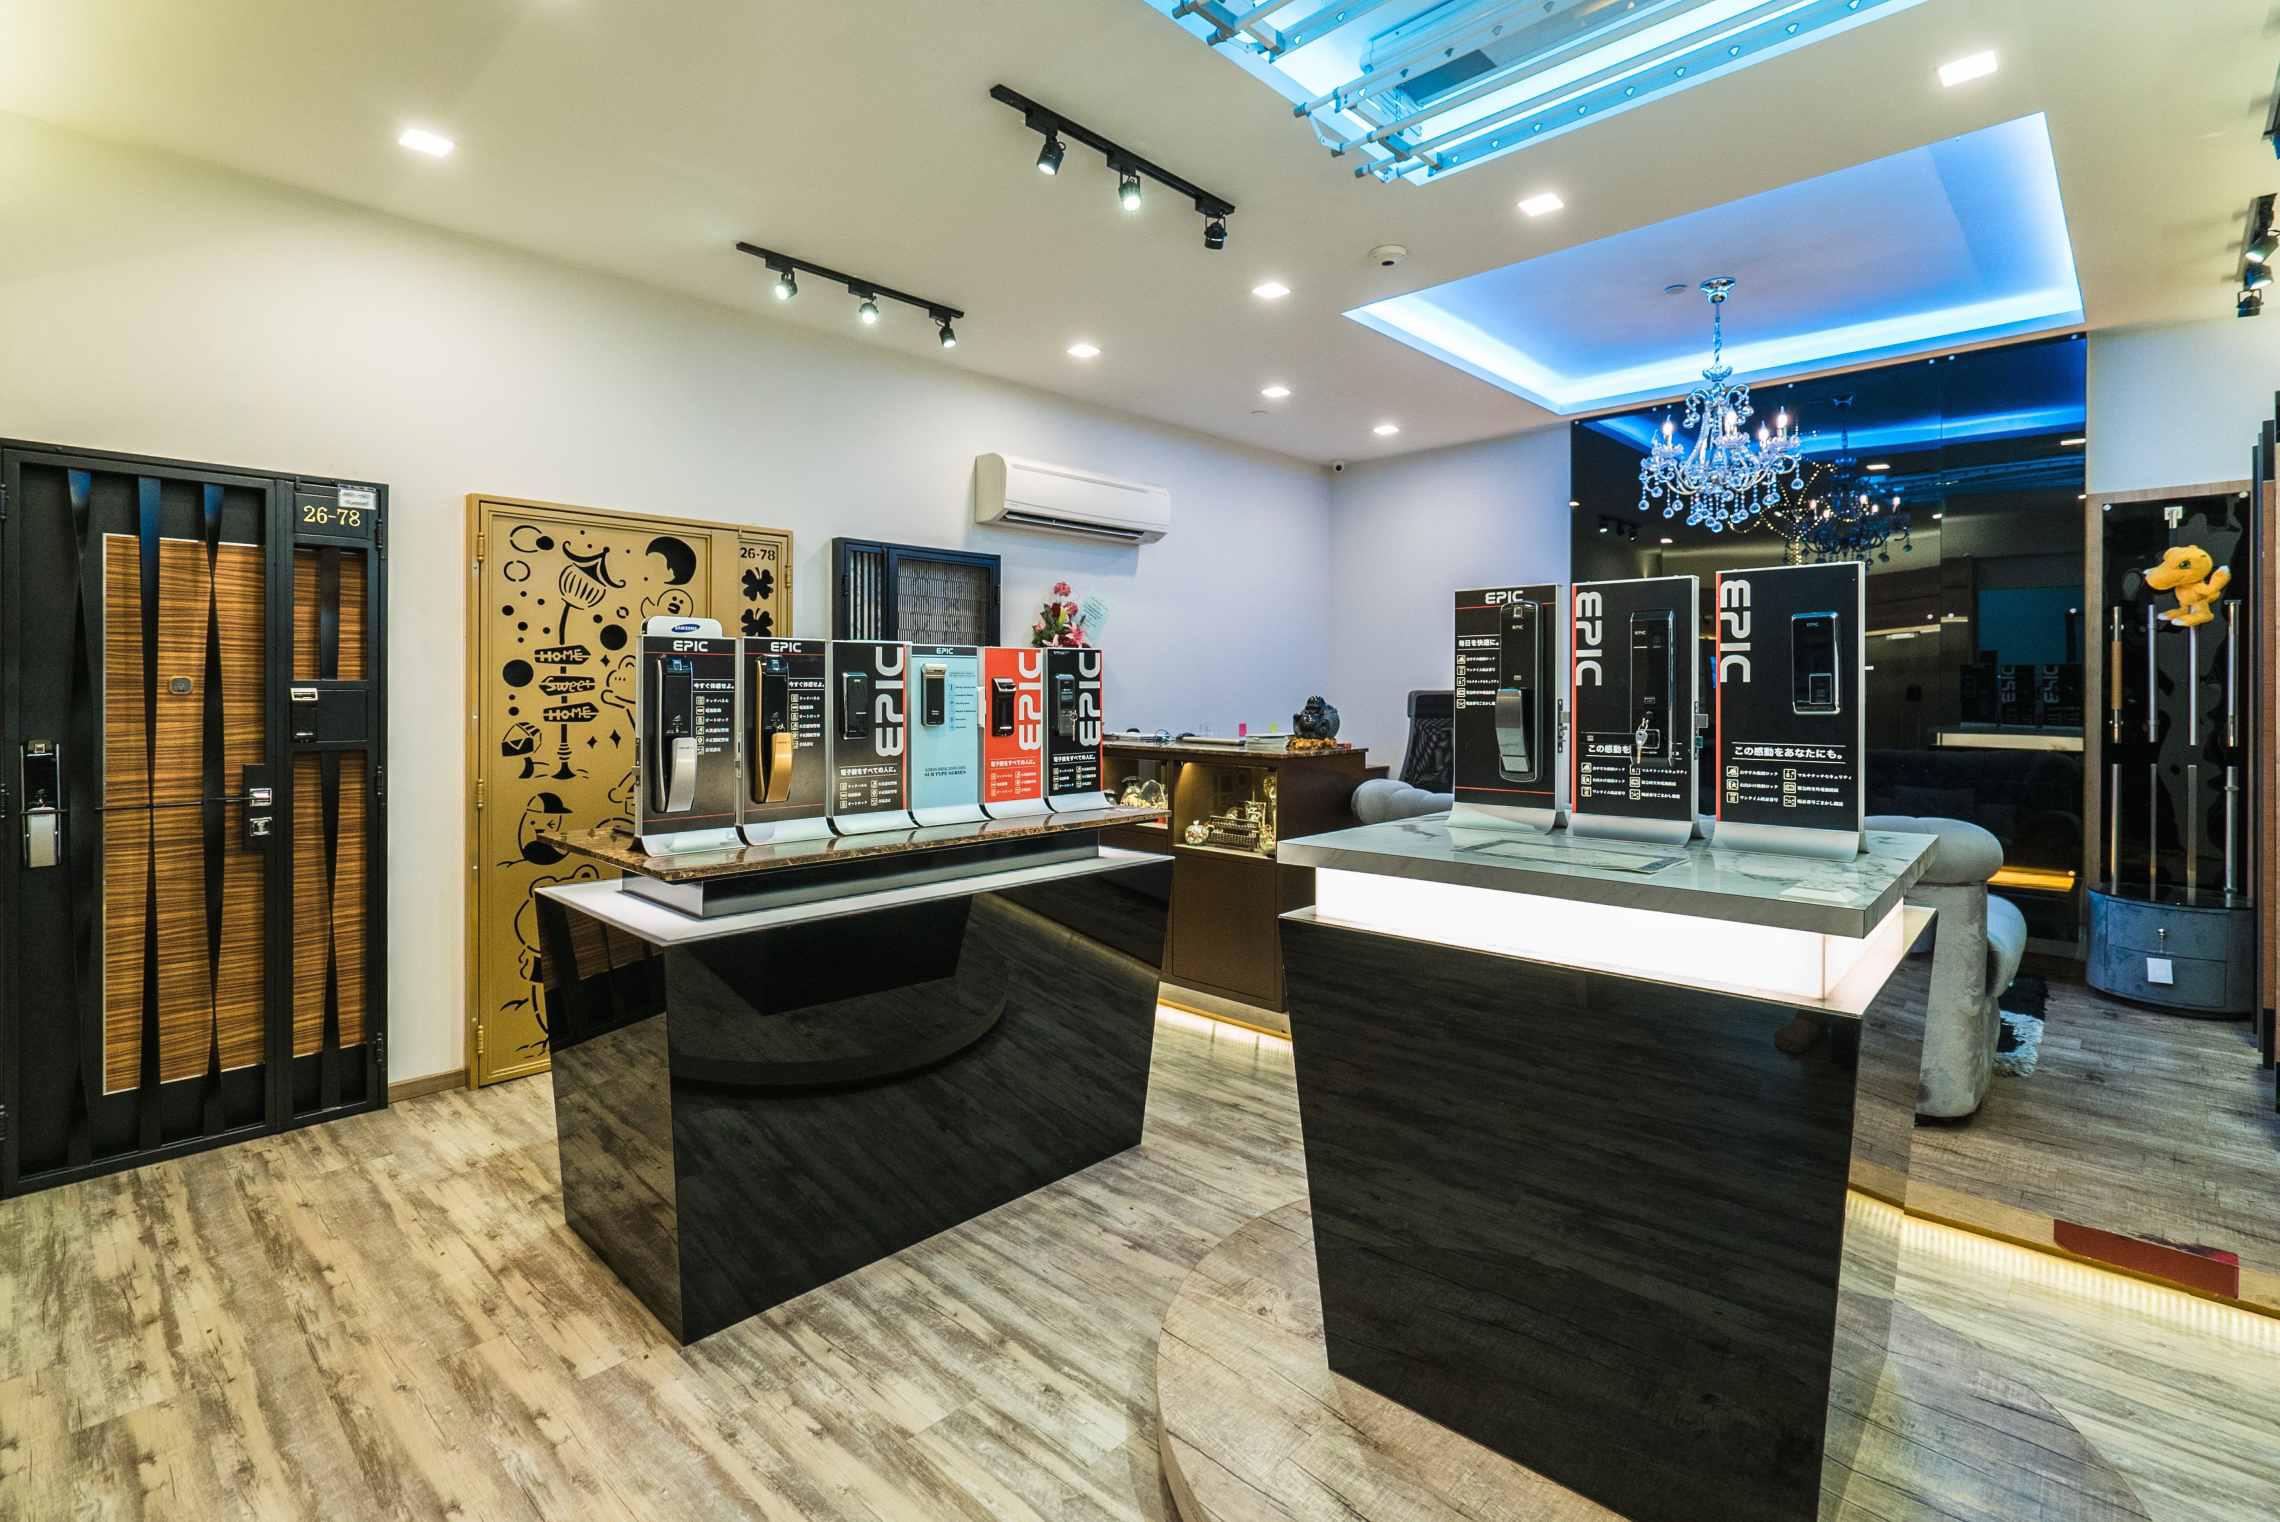 Digital Lock Show Room